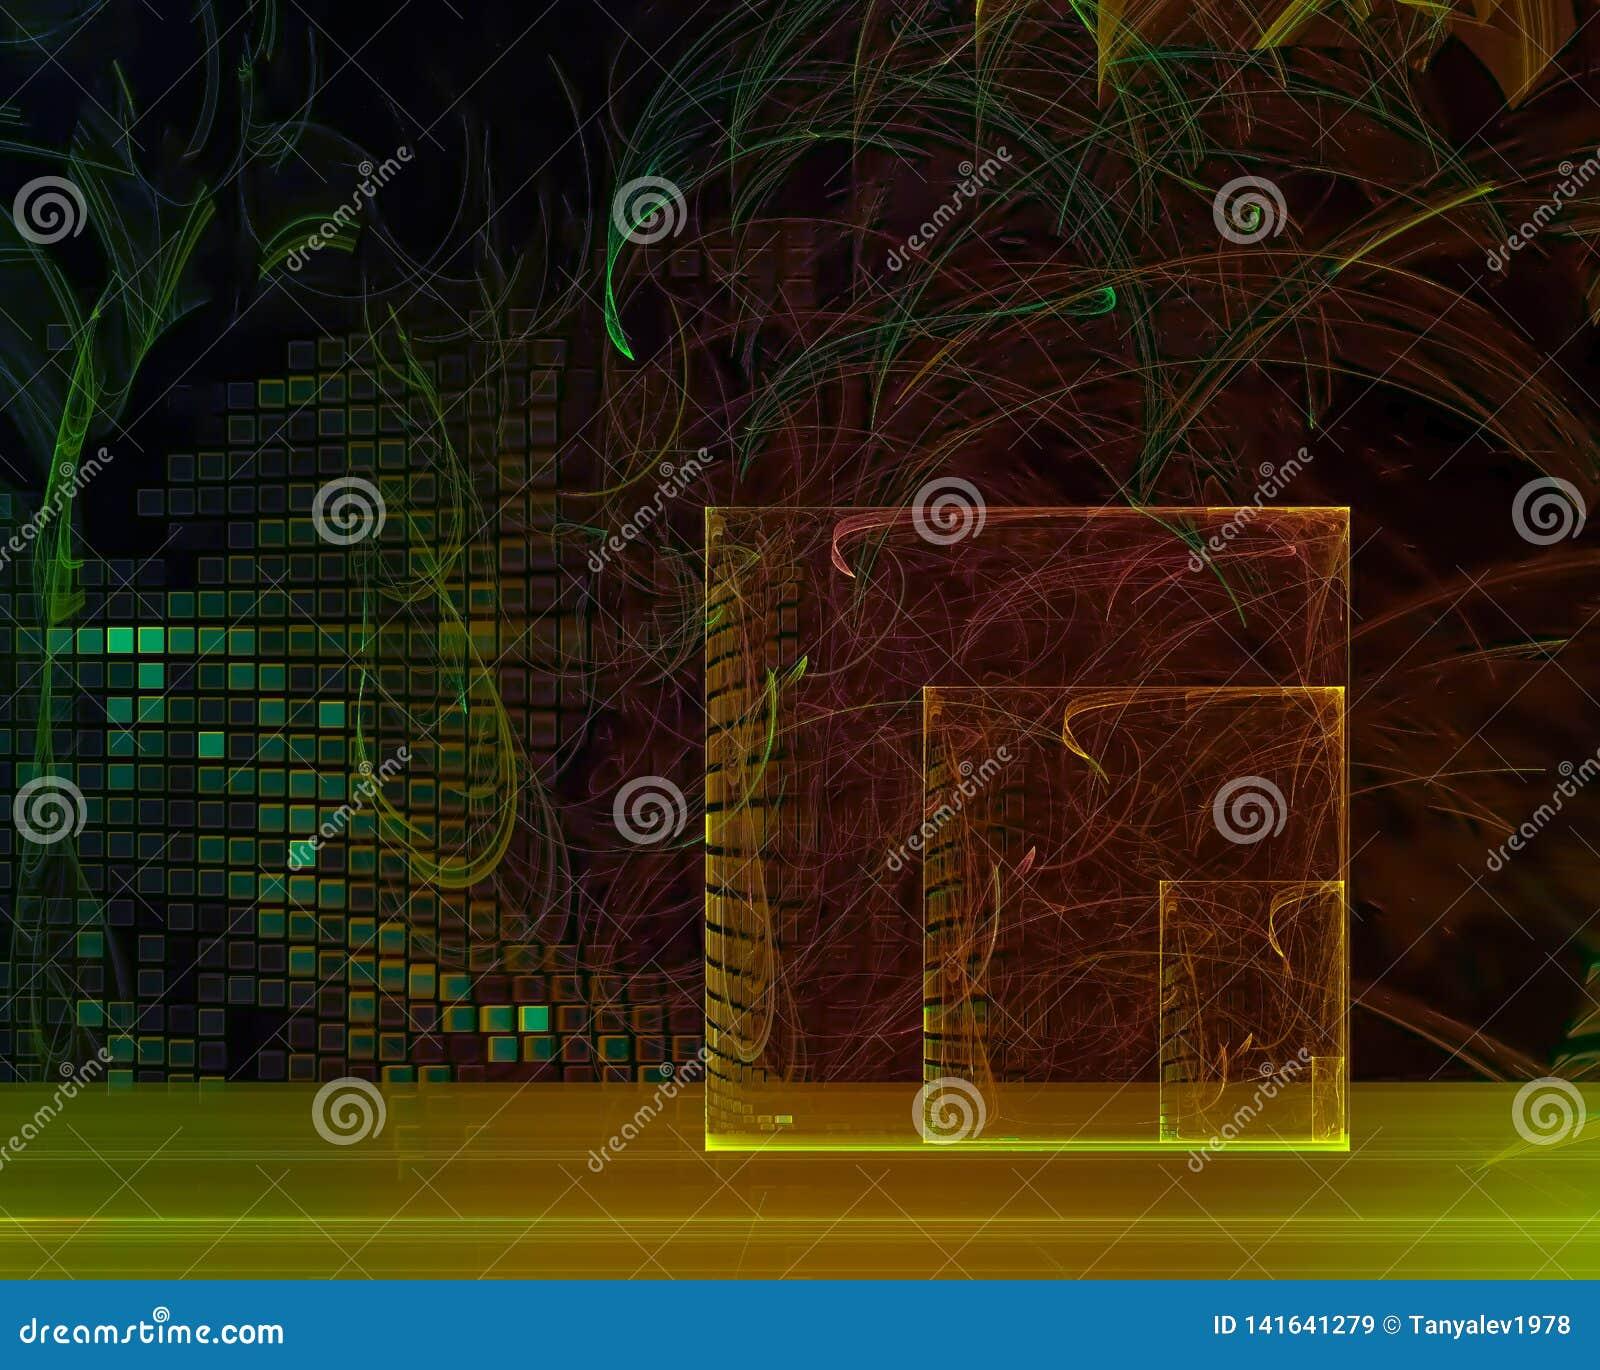 Abstract digital template fractal fantasy creative, artistic, elegance, dynamic